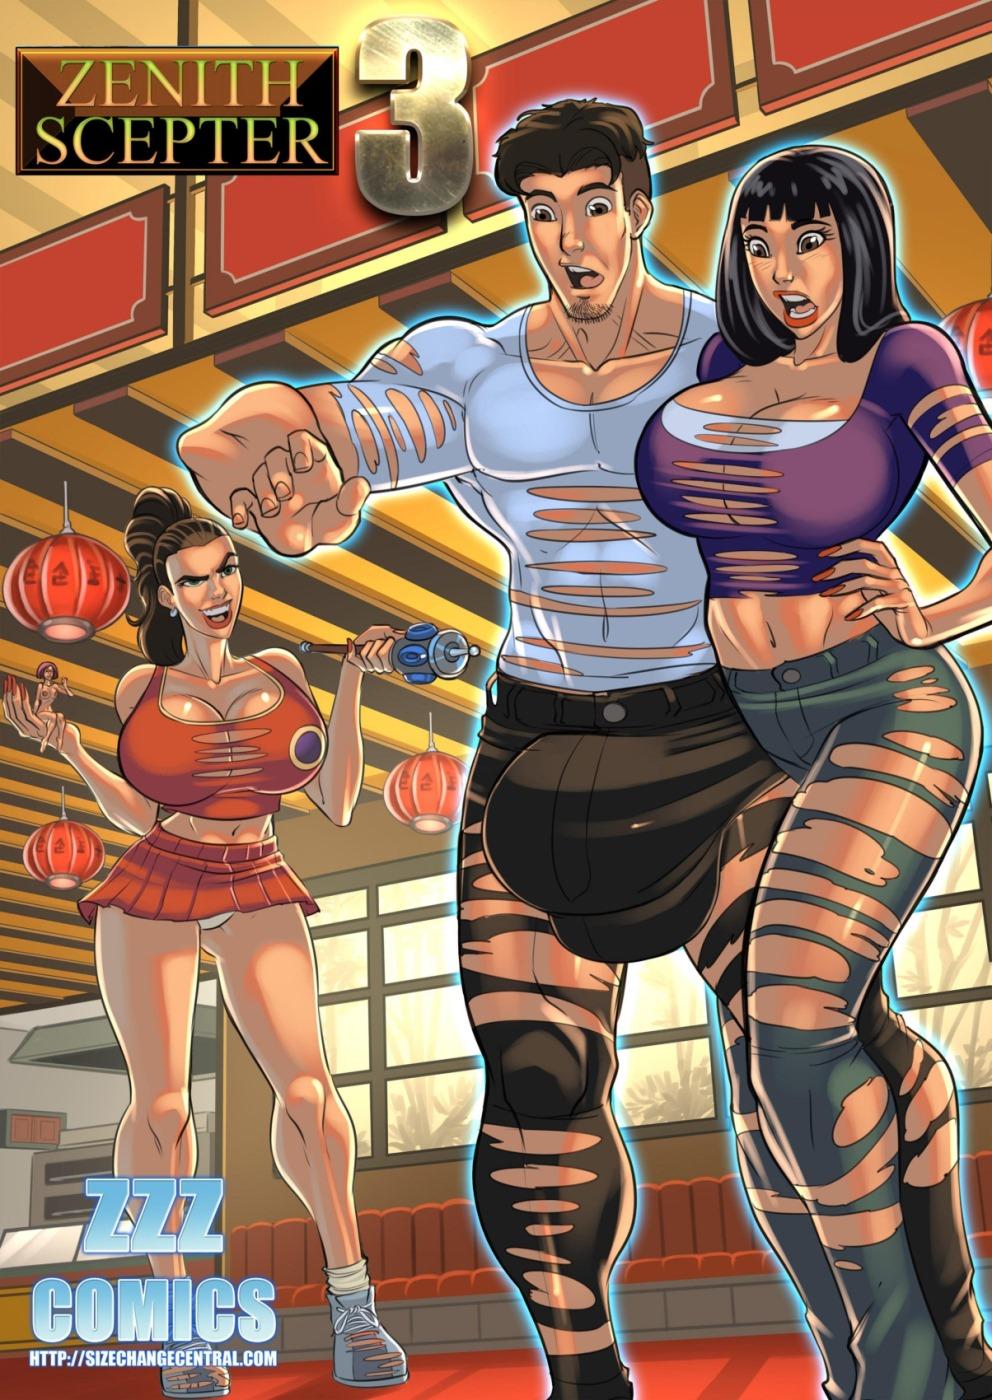 ZZZ- Zenith Scepter 3 porn comics 8 muses